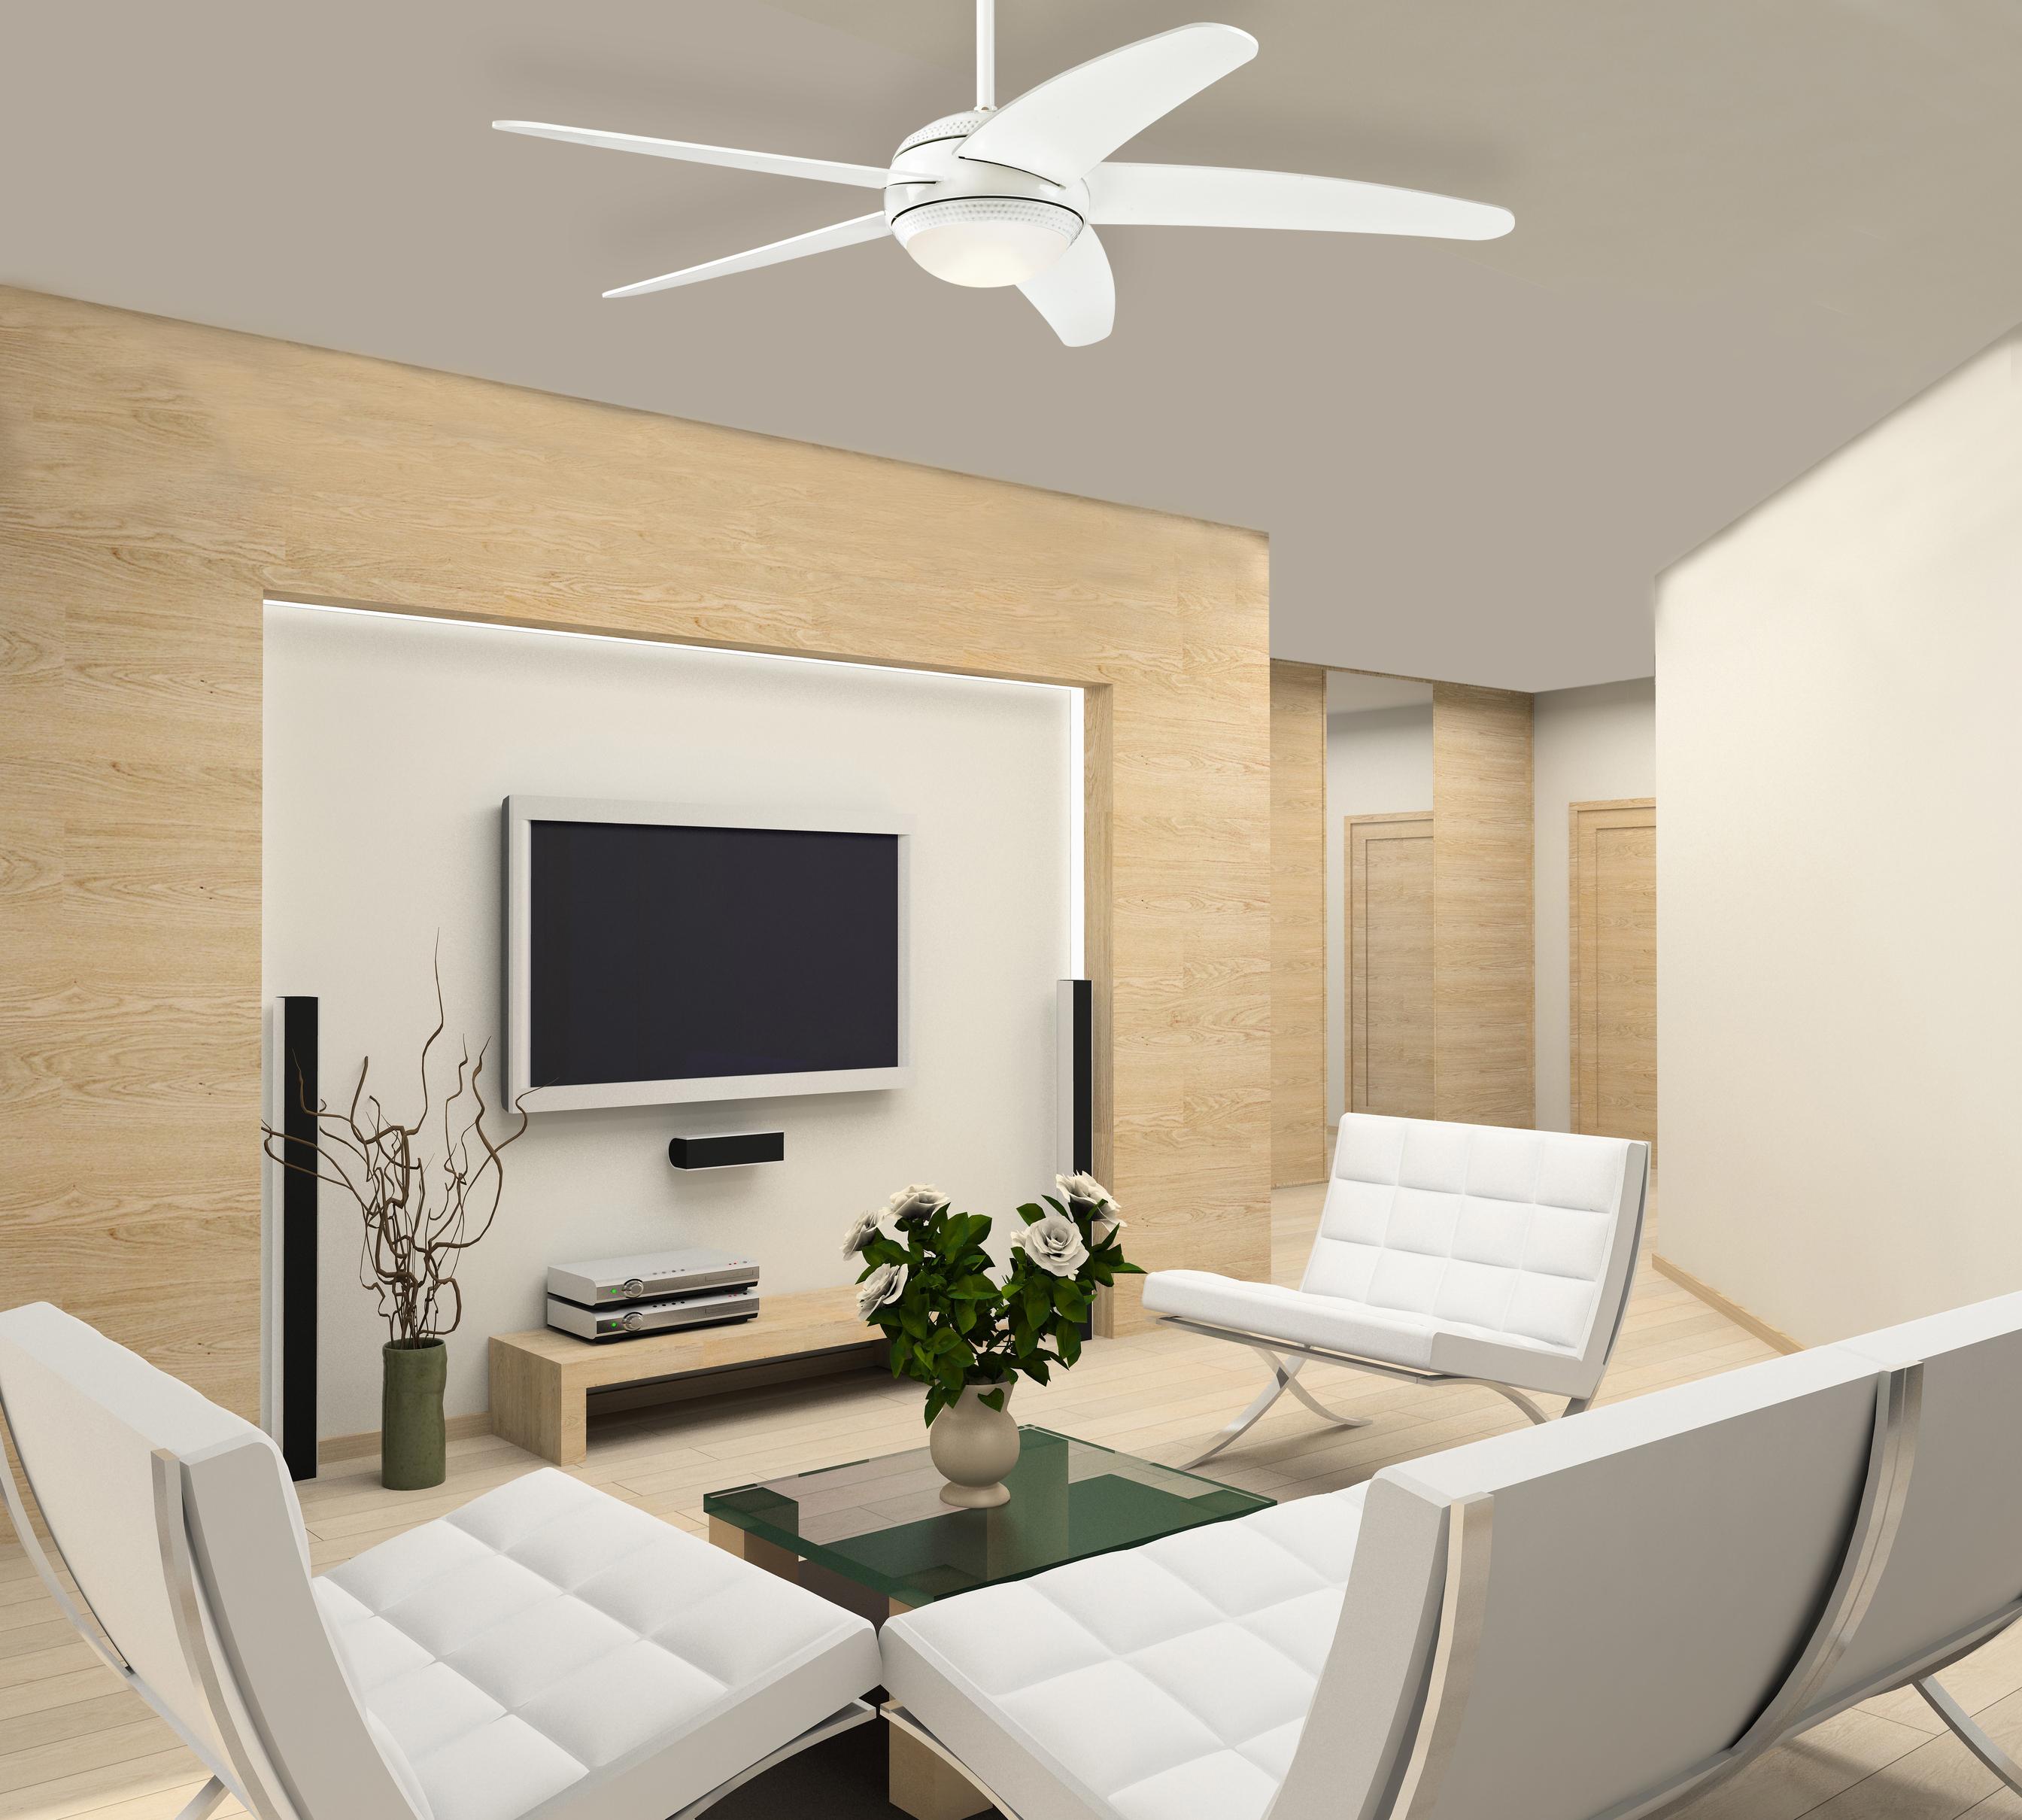 deckenventilator bendan led in wei mit fernbedienung deckenventilator deckenventilatoren mit. Black Bedroom Furniture Sets. Home Design Ideas